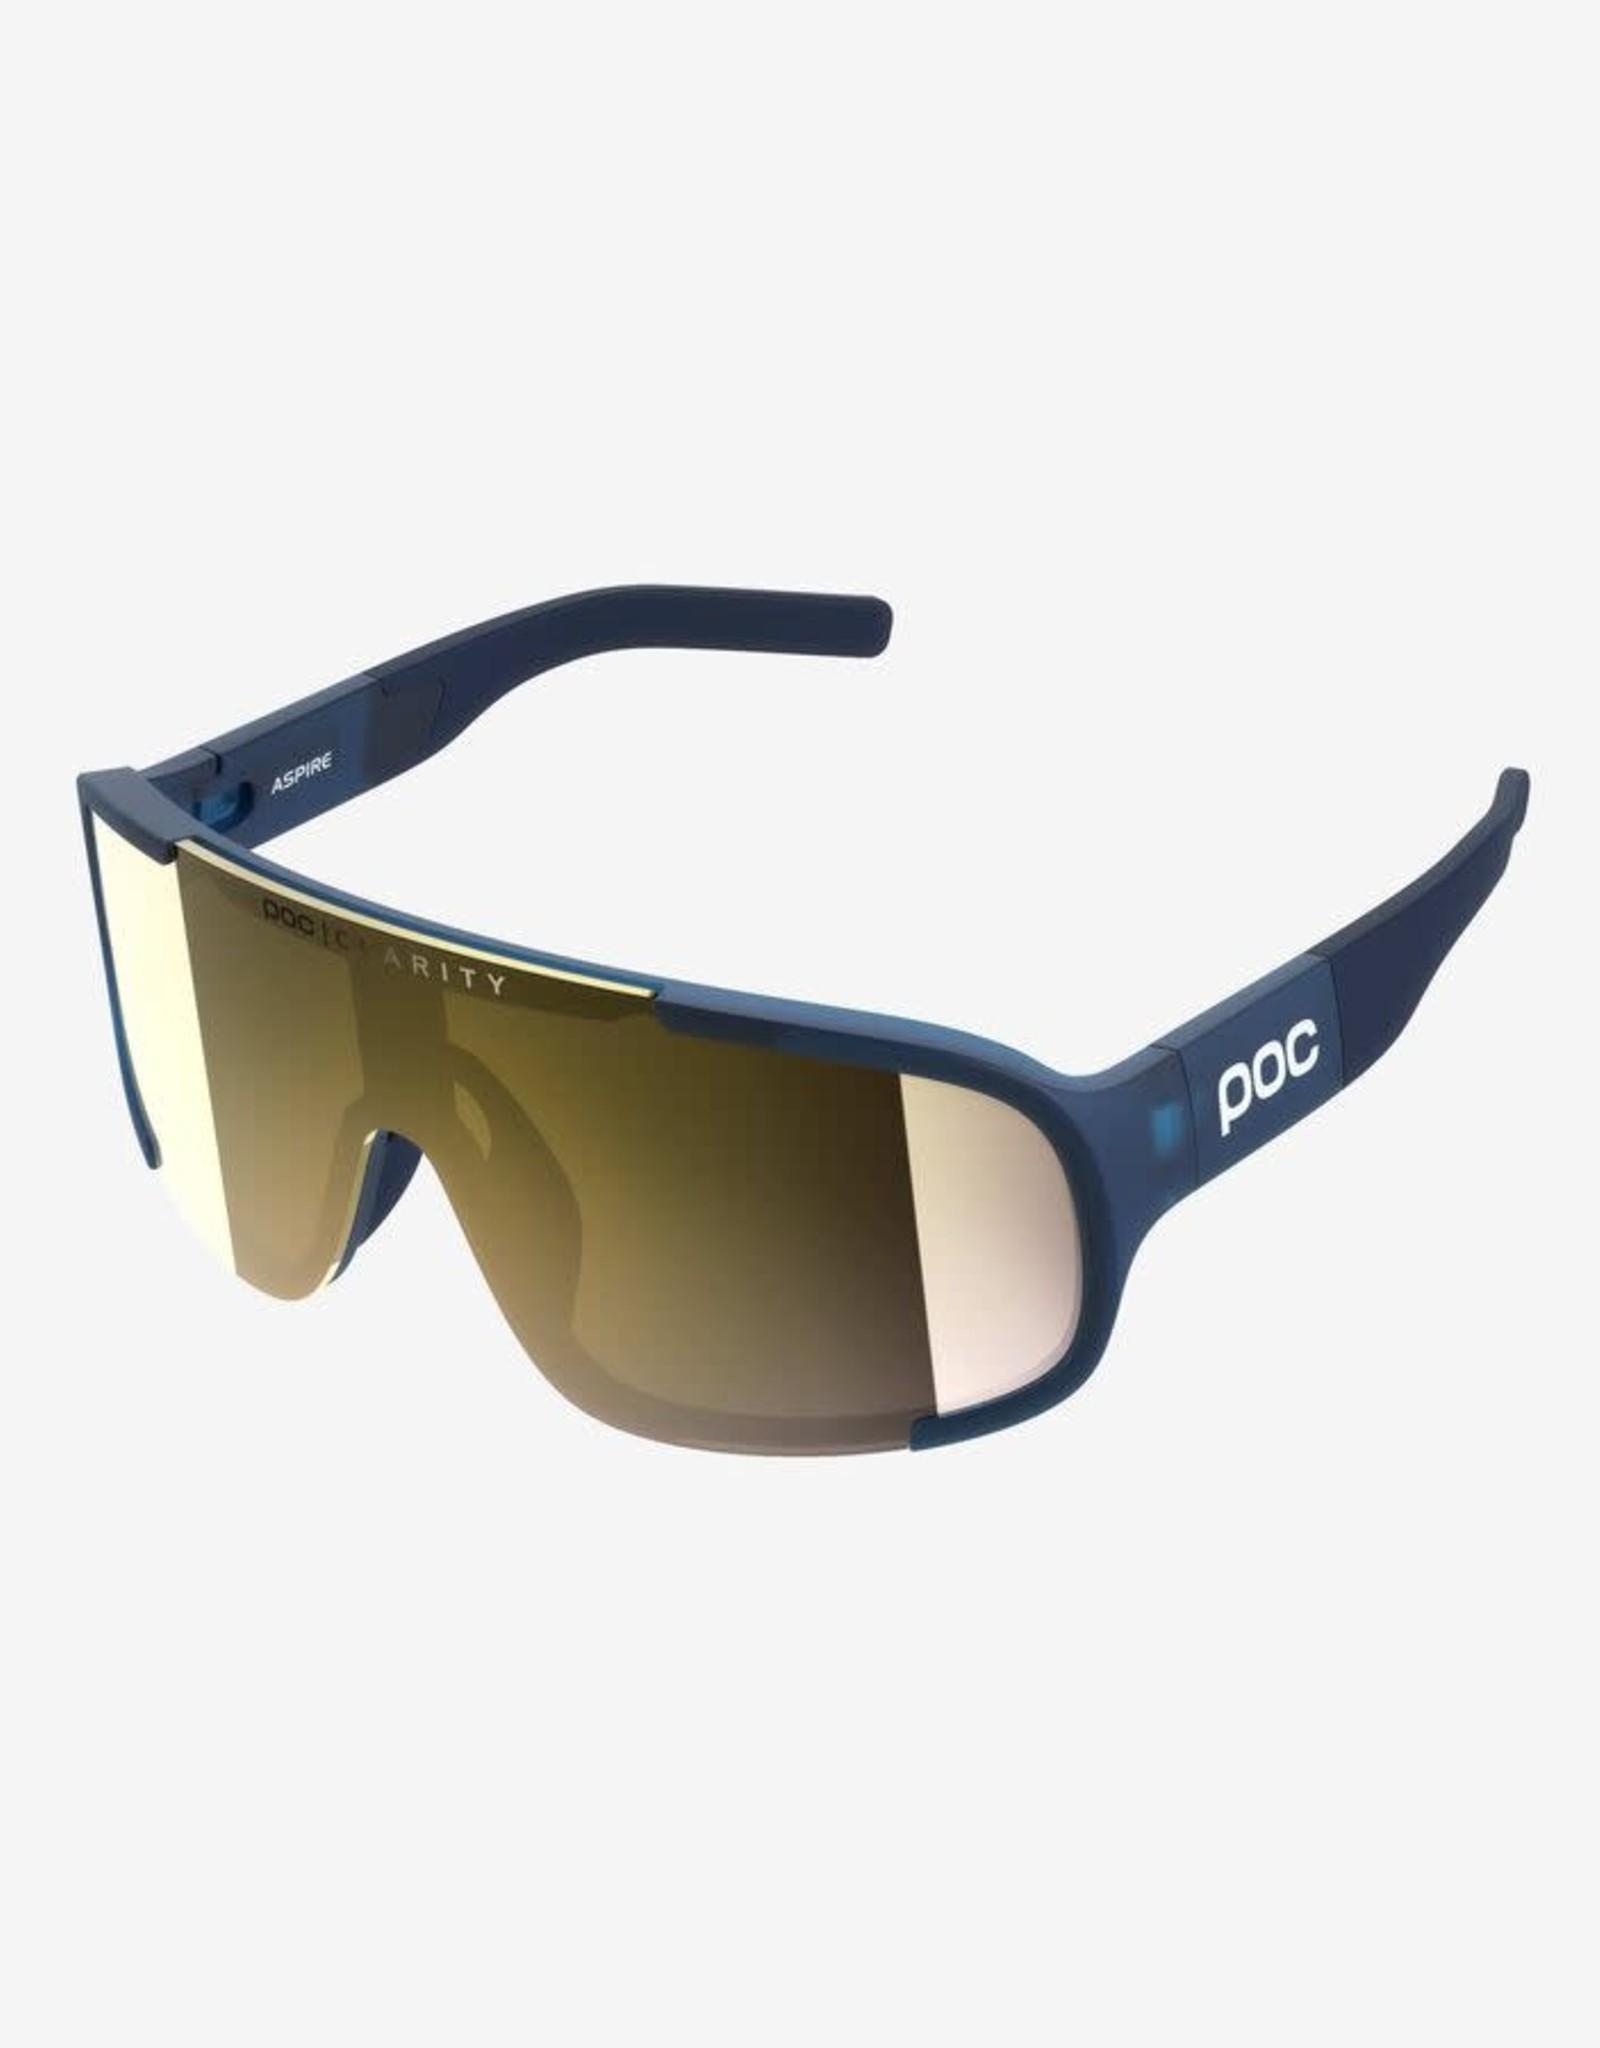 POC Cycling glasses Aspire - Lead Blue VGM